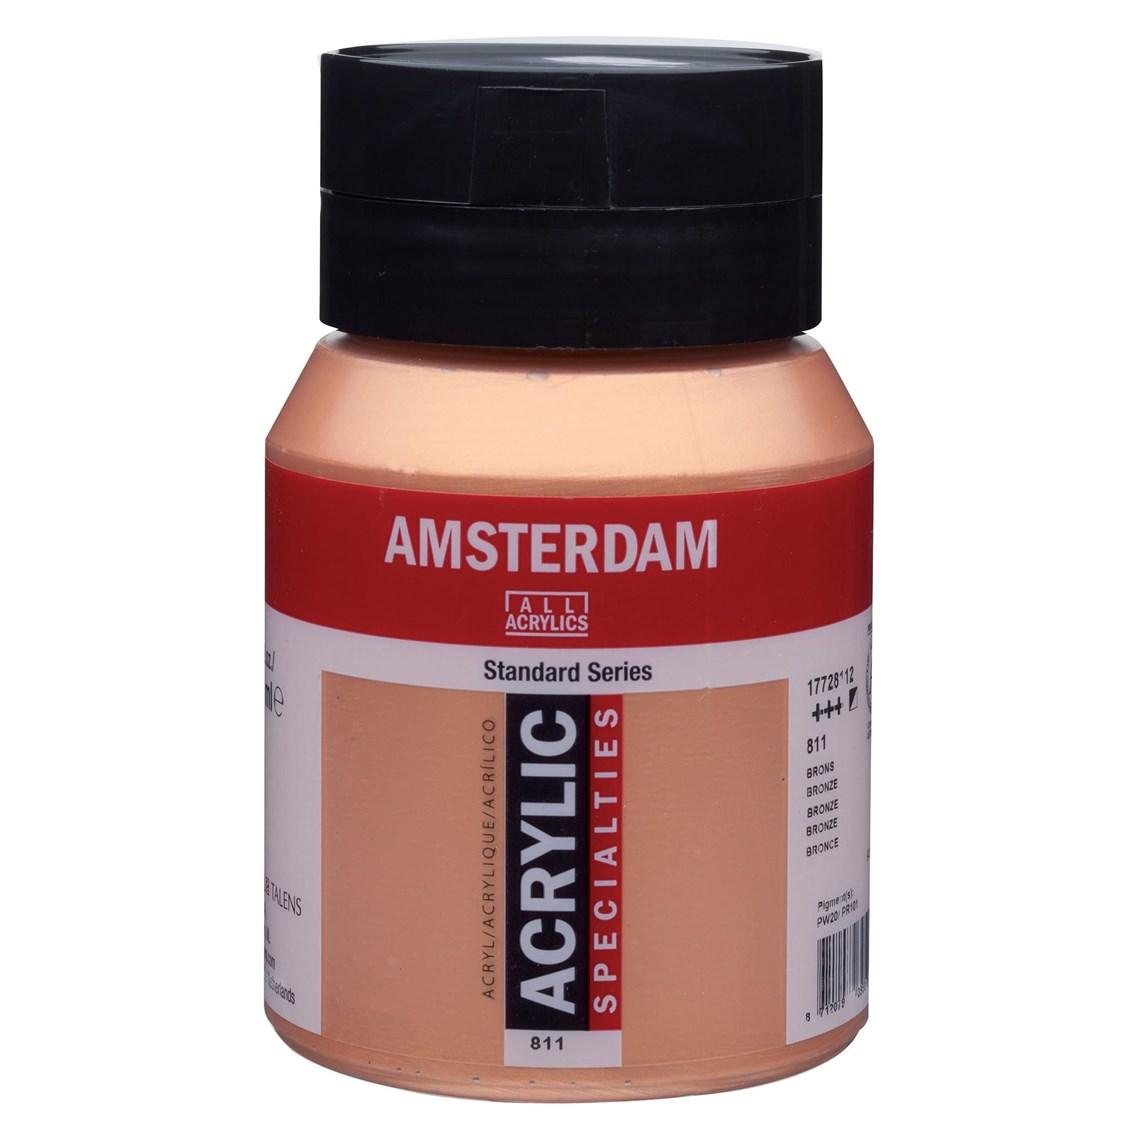 Amsterdam Acryl Brons 811 specialties